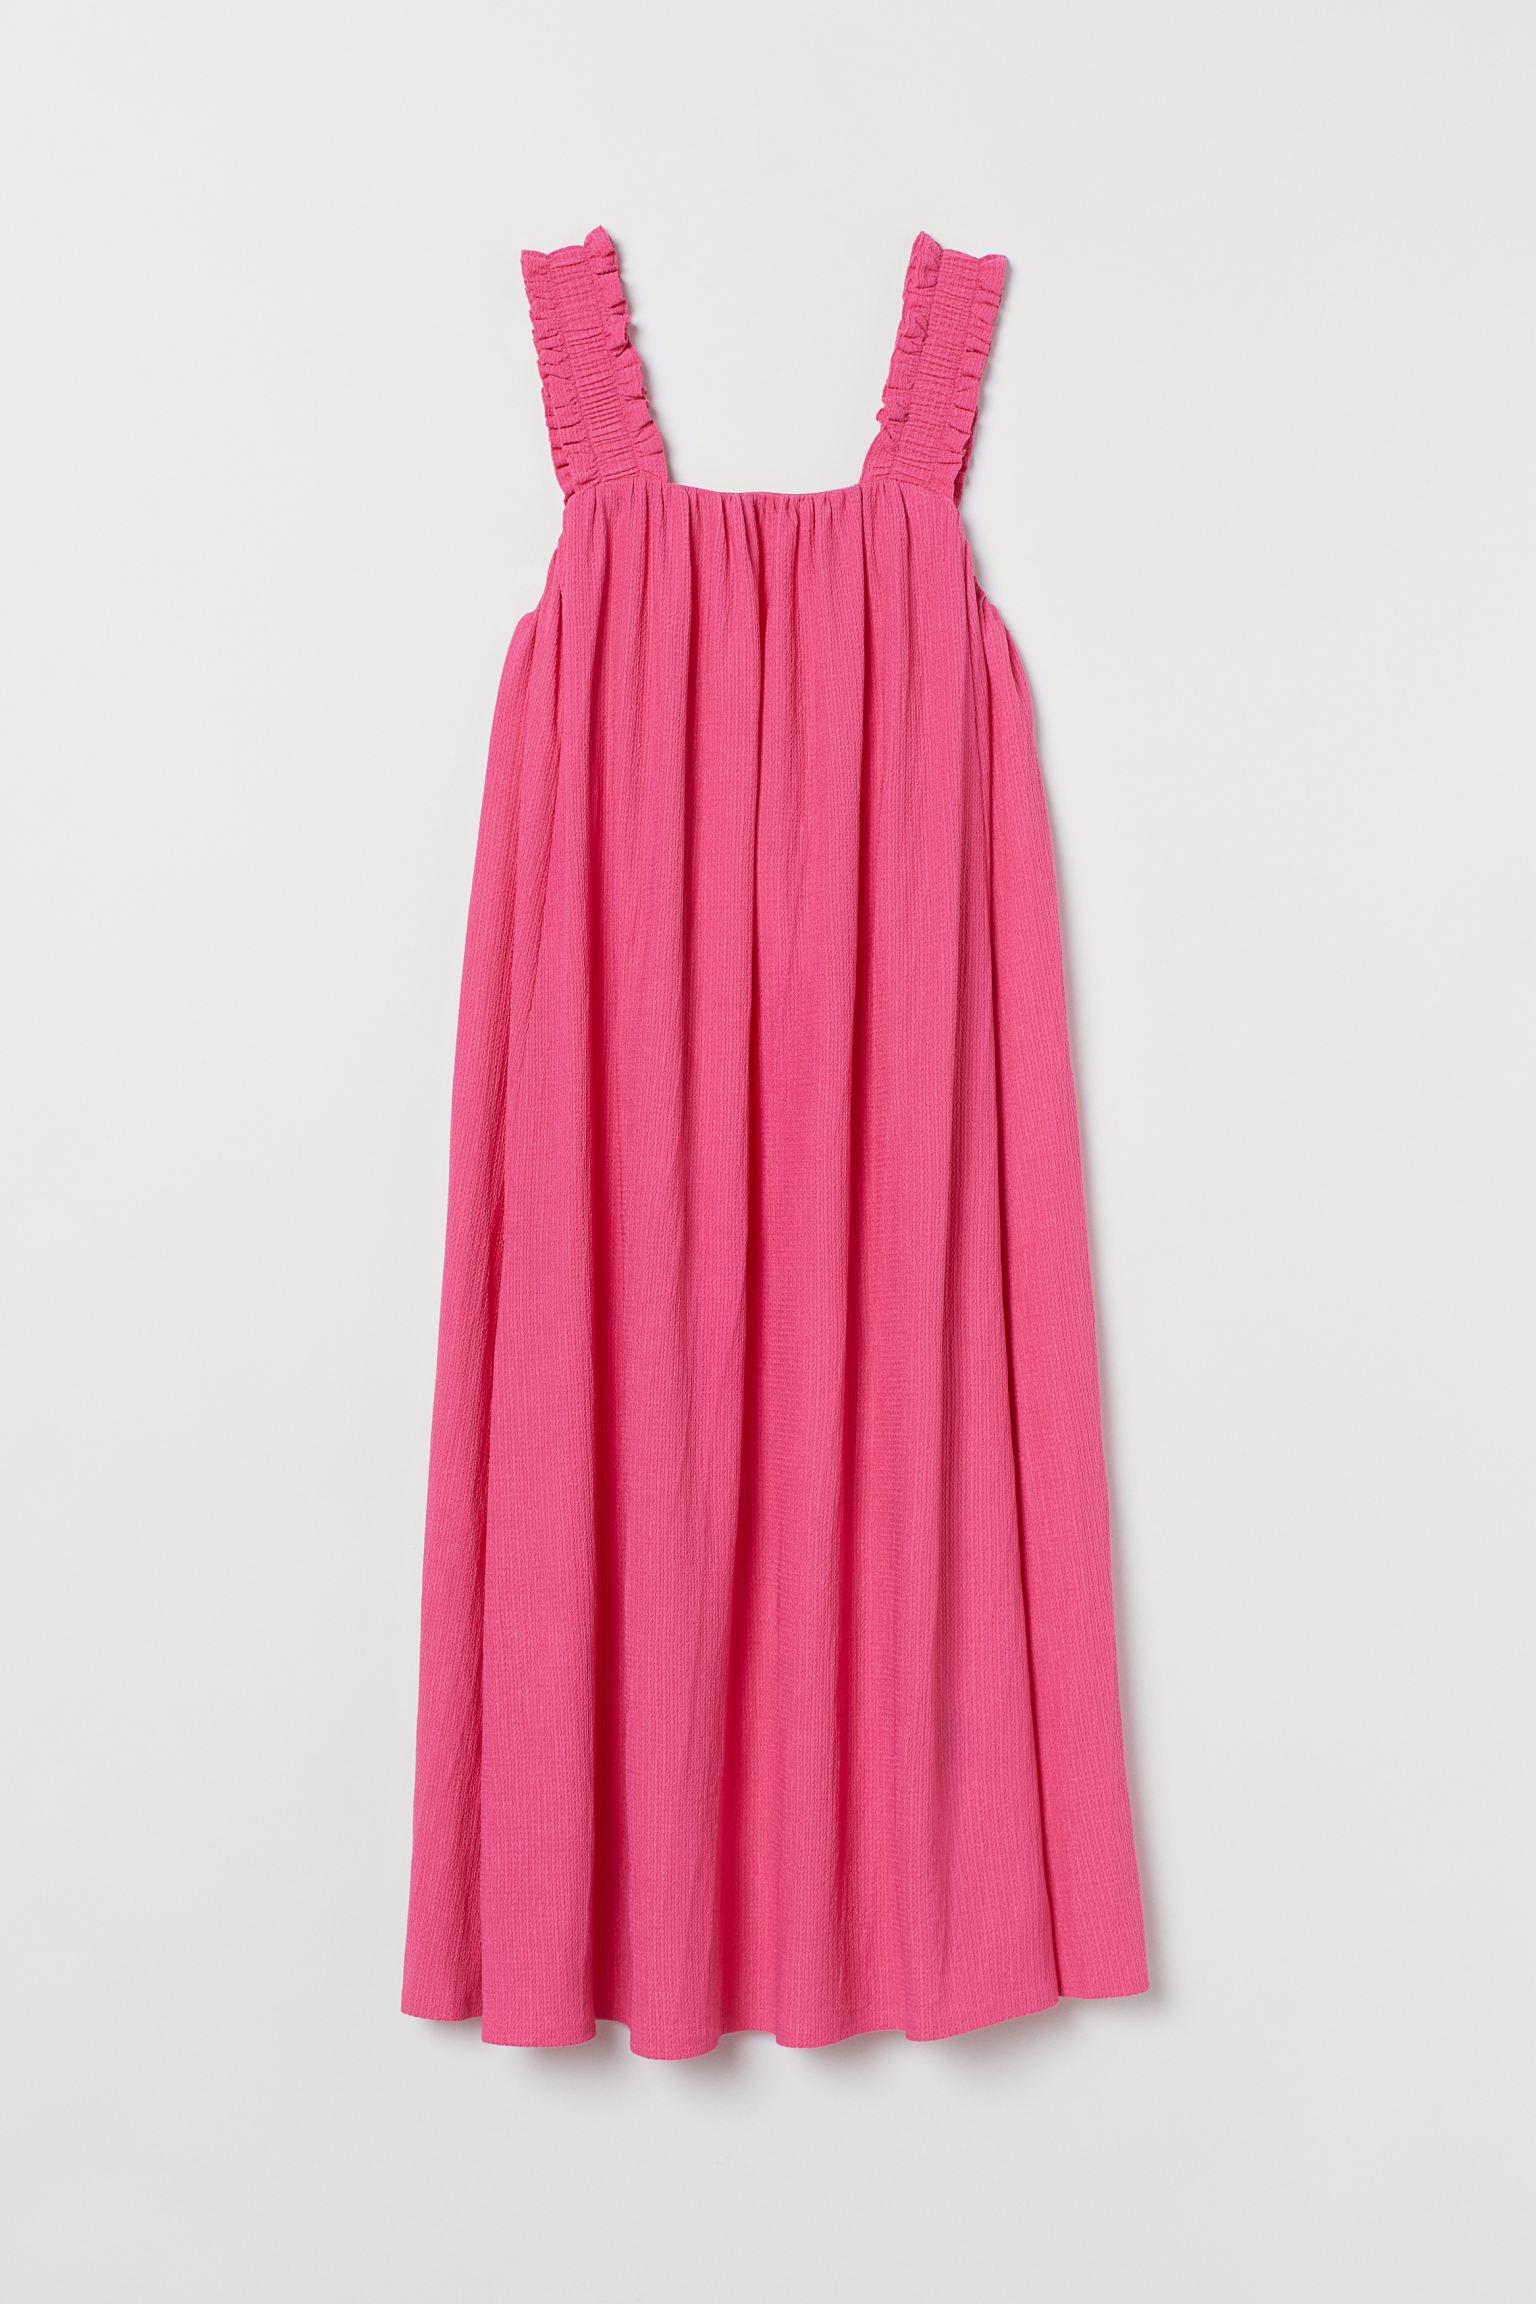 roze jurk met strik H&M